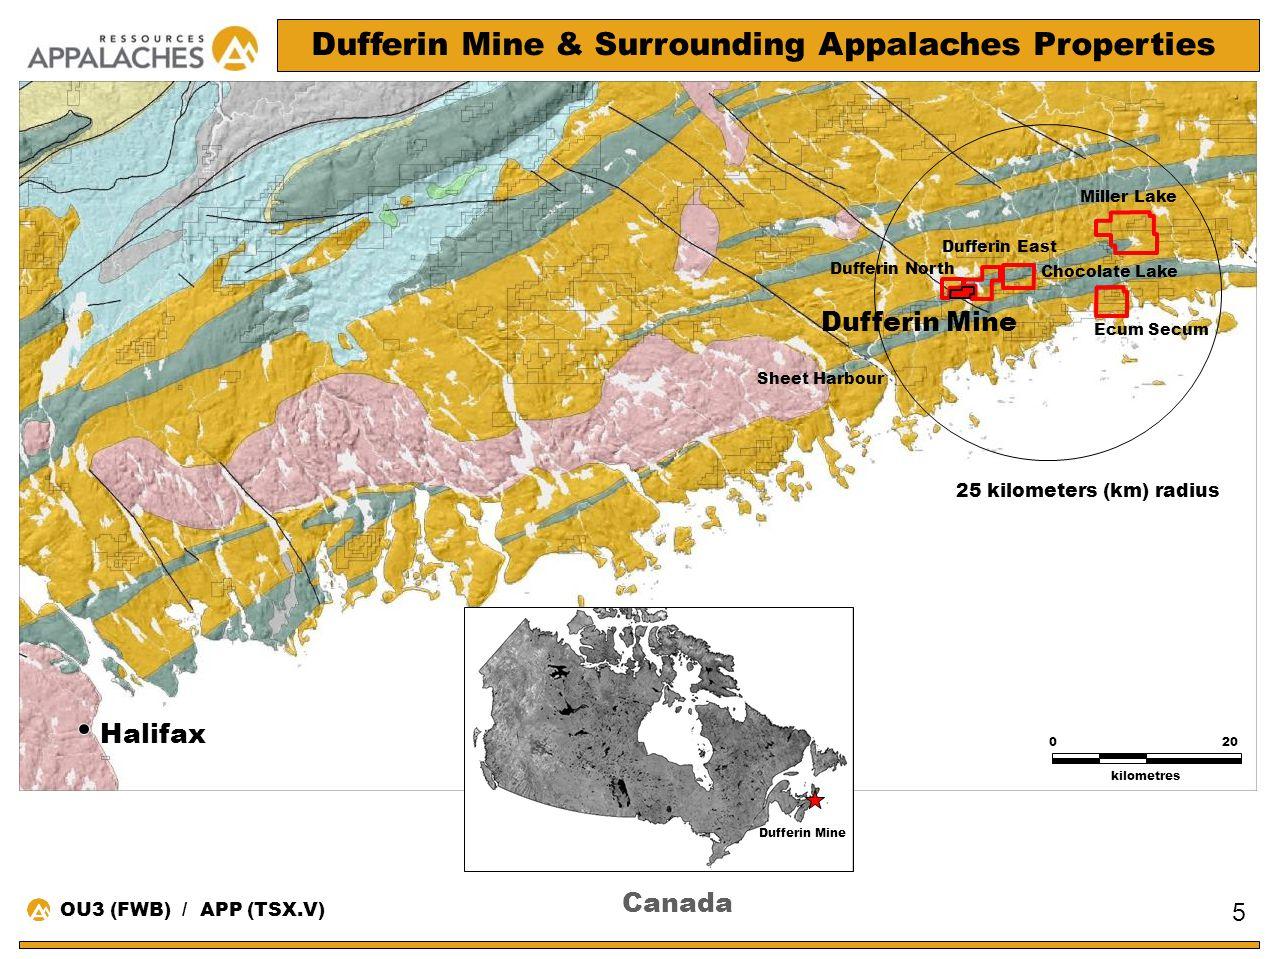 Canada Halifax Sheet Harbour 020 kilometres Miller Lake Dufferin Mine Dufferin Mine & Surrounding Appalaches Properties Chocolate Lake Ecum Secum 5 25